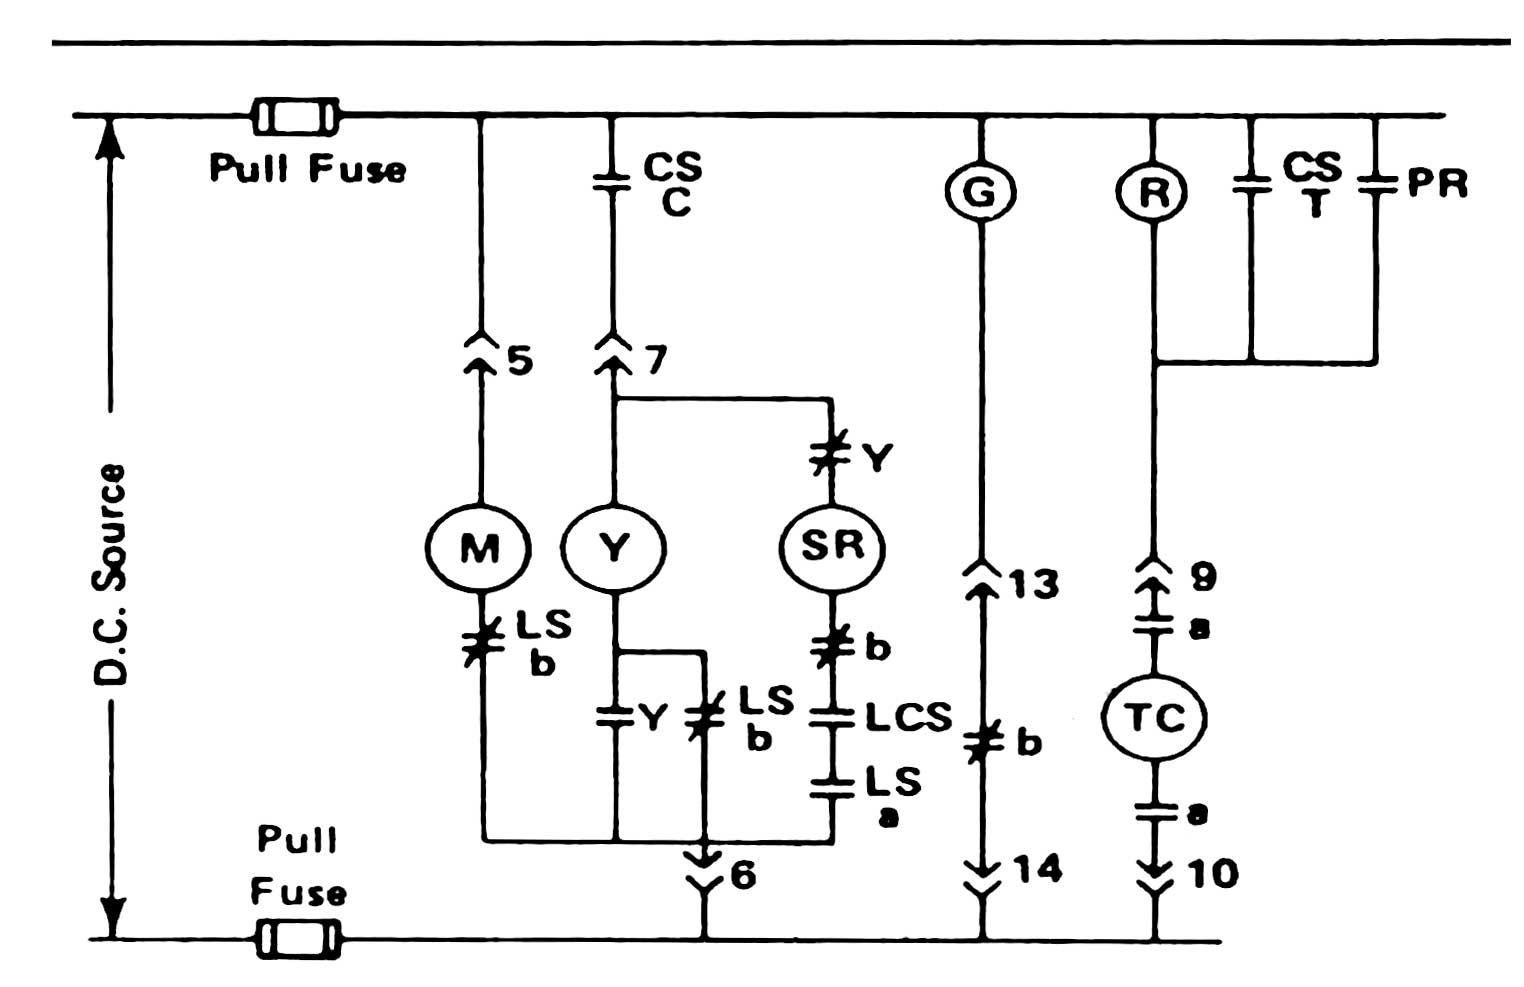 A Quick Look At A Typical Medium Voltage Circuit Breaker